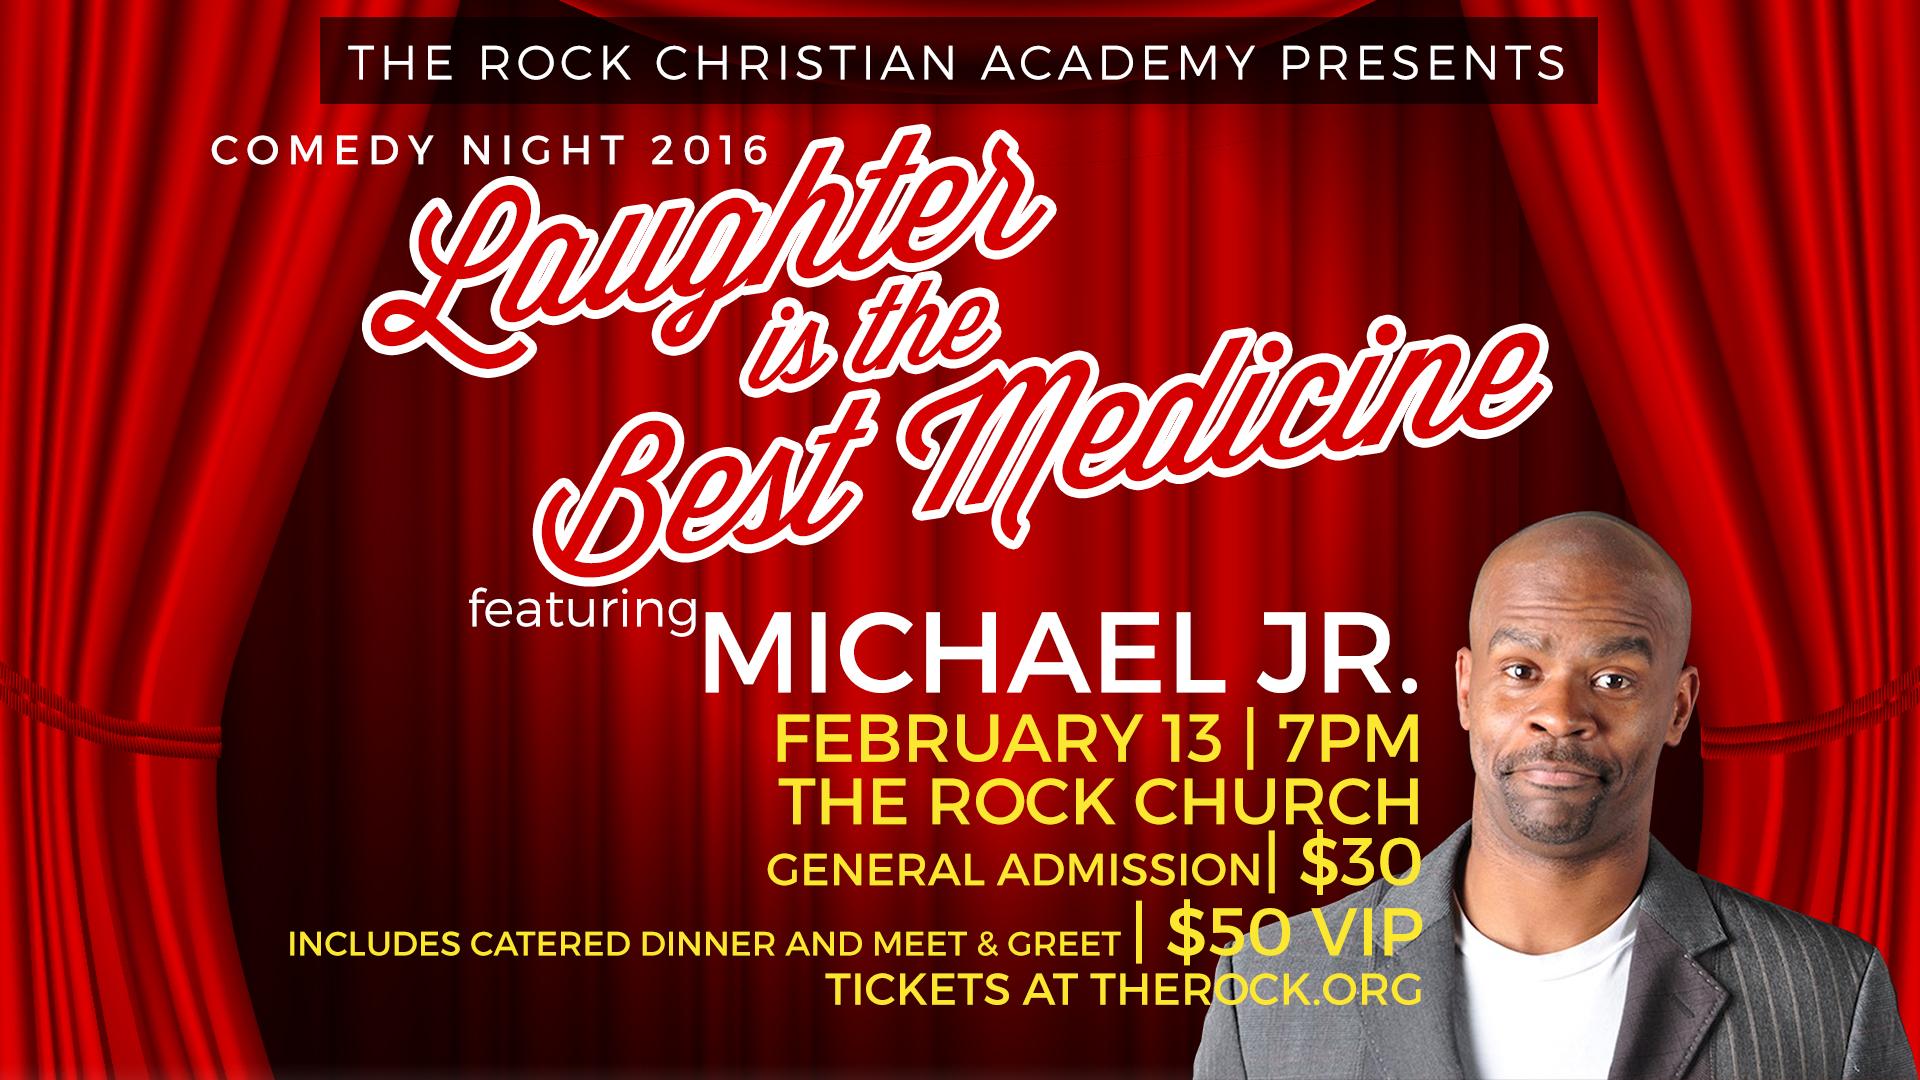 michael jr comedy night